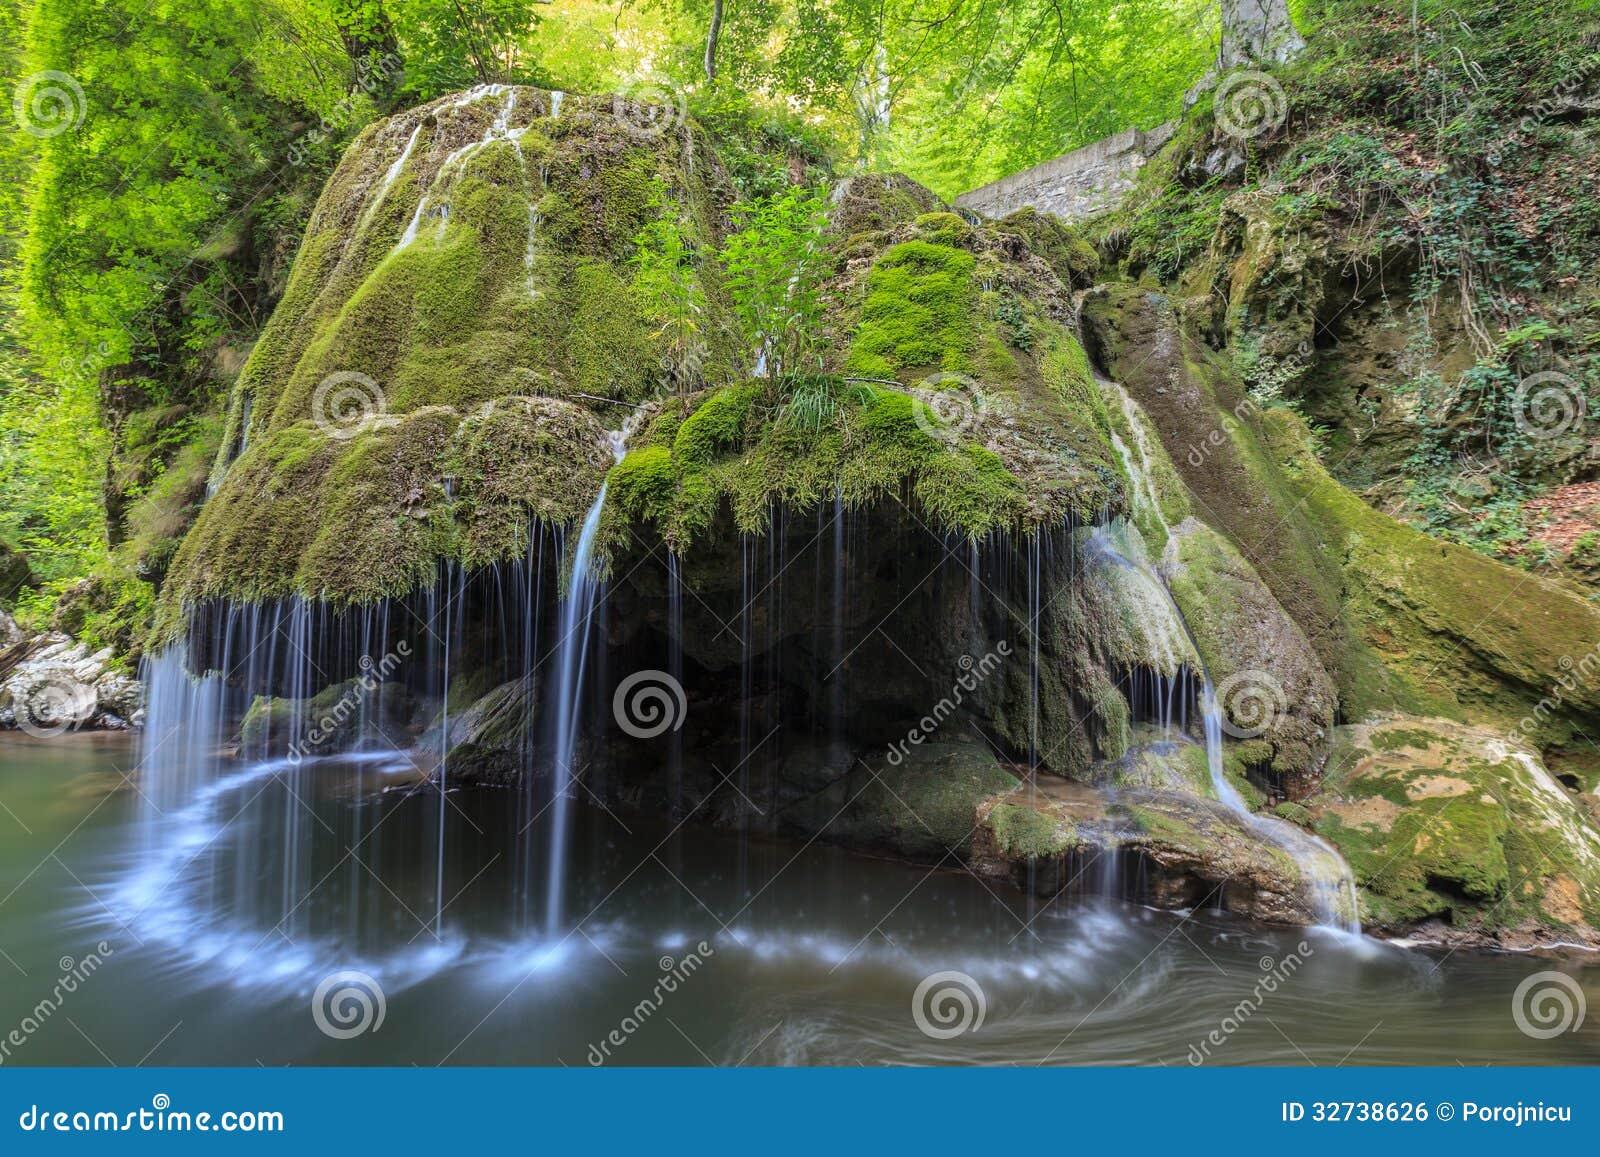 Waterfall Plans